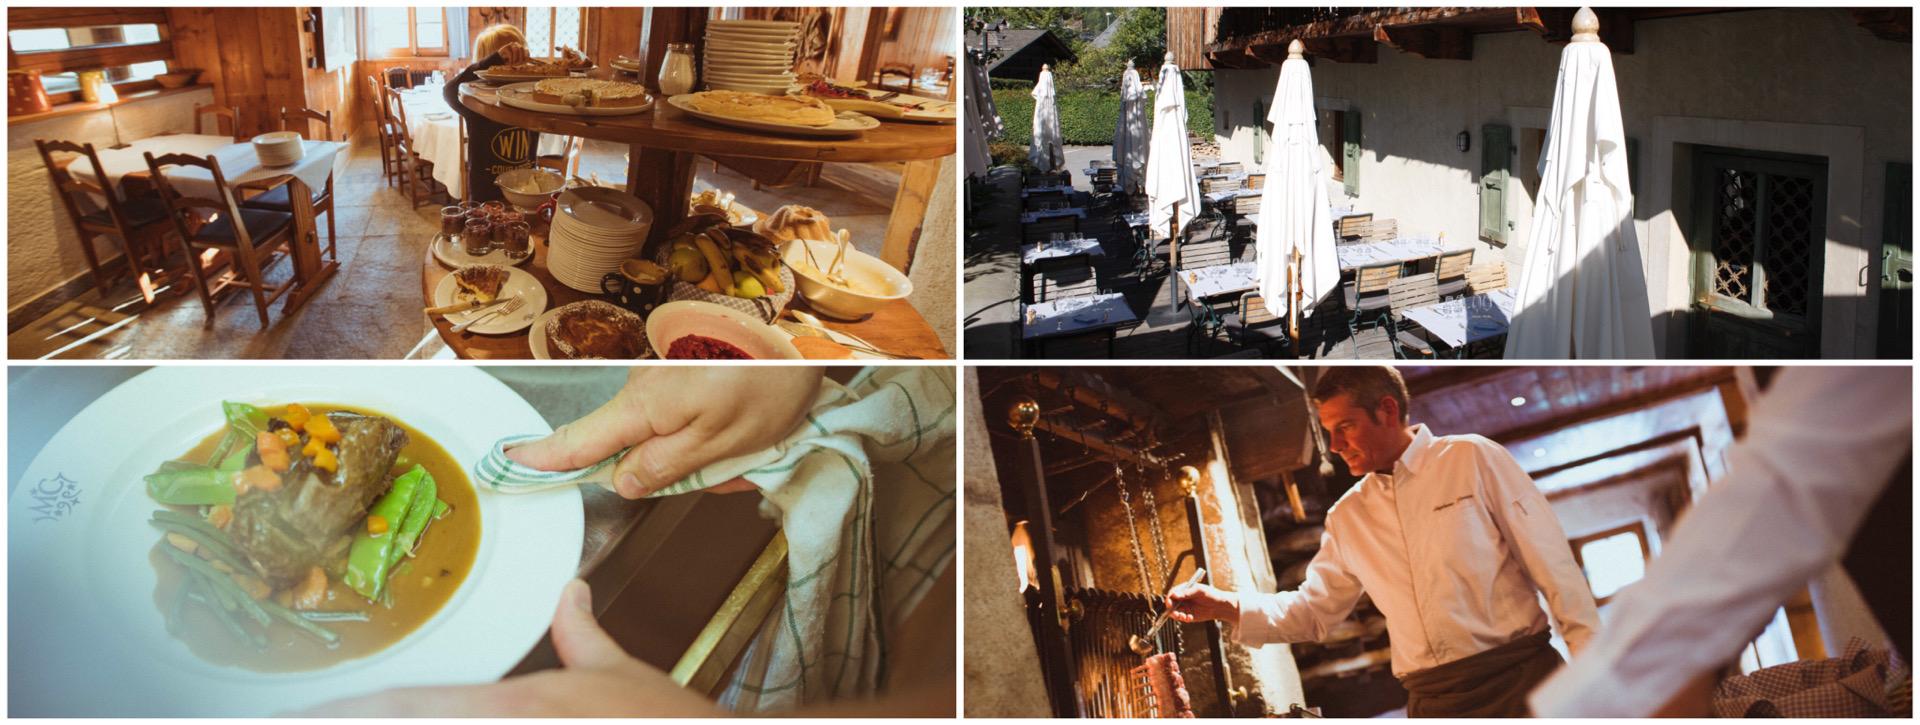 La Maison Carrier restaurant in Chamonix, French Alps